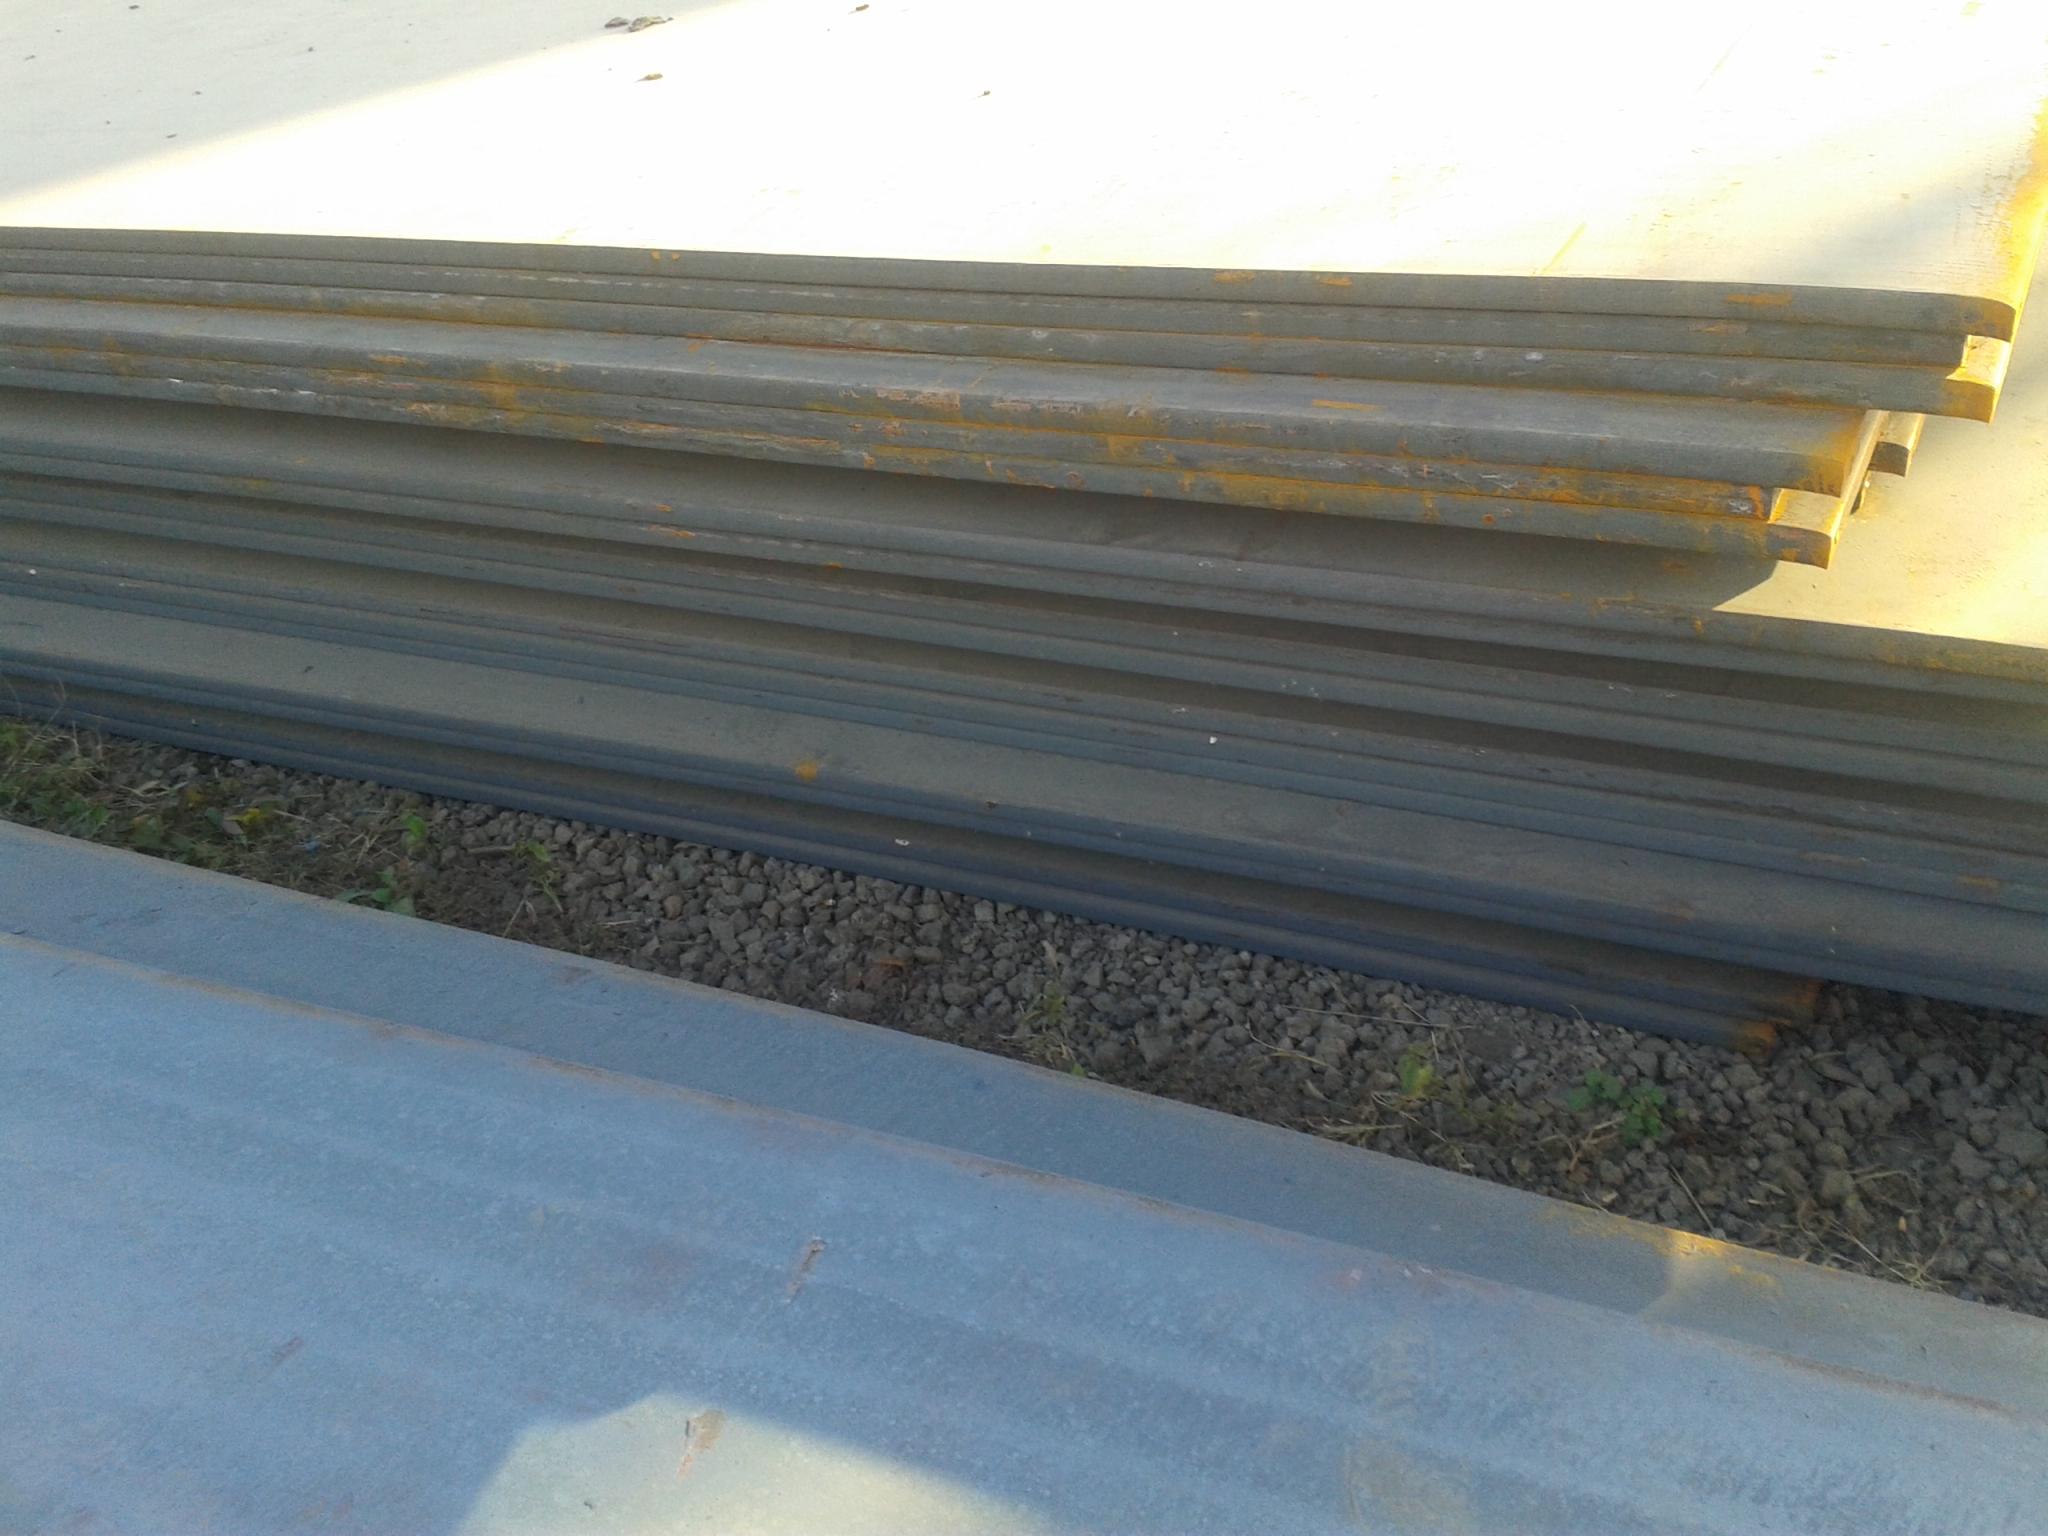 25CrMo4钢板_Q355GNH耐候金属建材多少钱-山东运通达金属材料有限公司